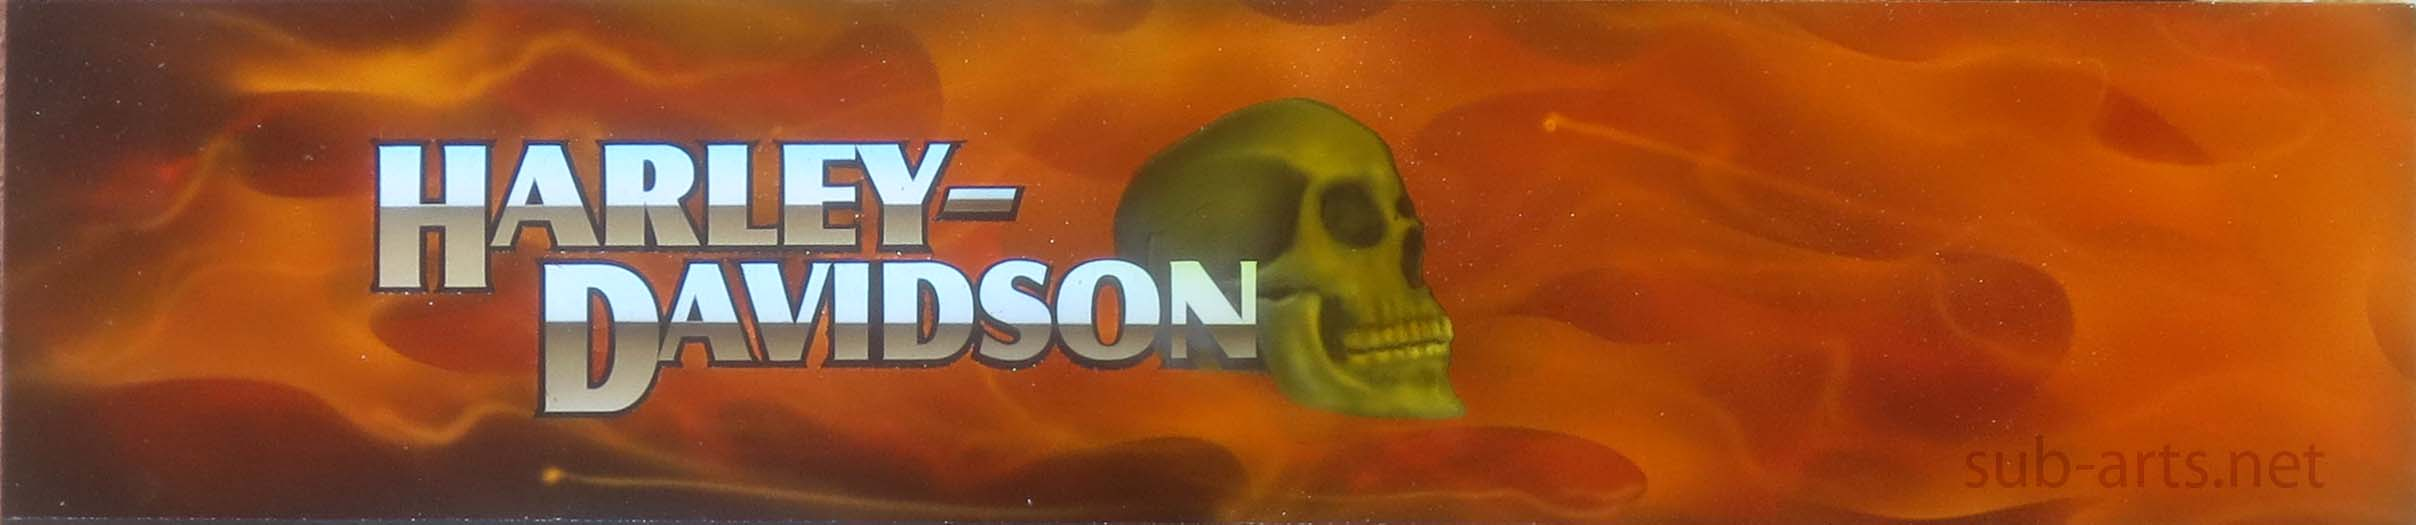 true-fire-harley-davidson-skull-airbrush